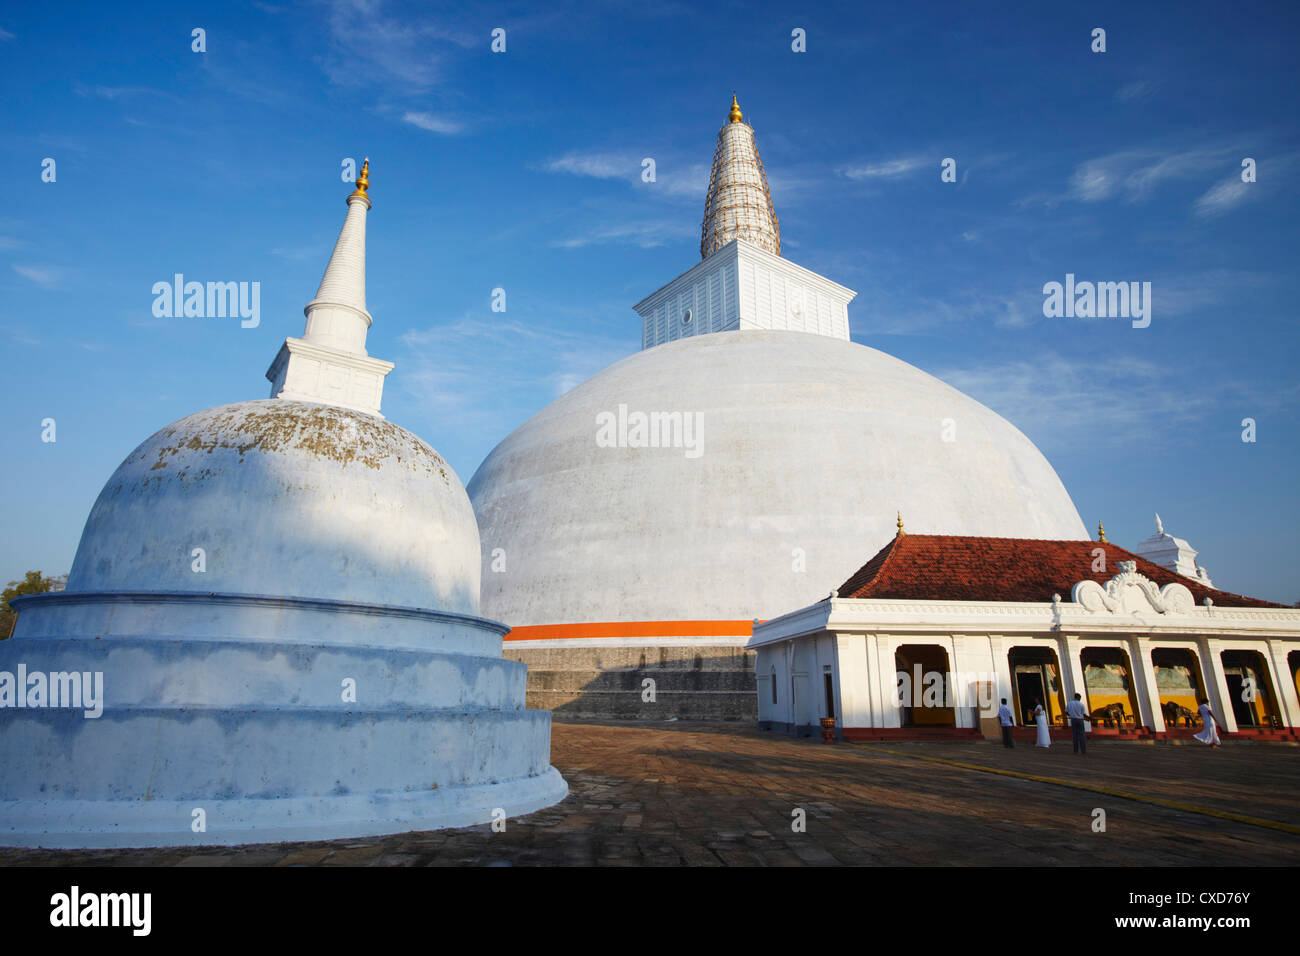 Ruvanvelisaya Dagoba, Anuradhapura, UNESCO World Heritage Site, North Central Province, Sri Lanka, Asia Stock Photo